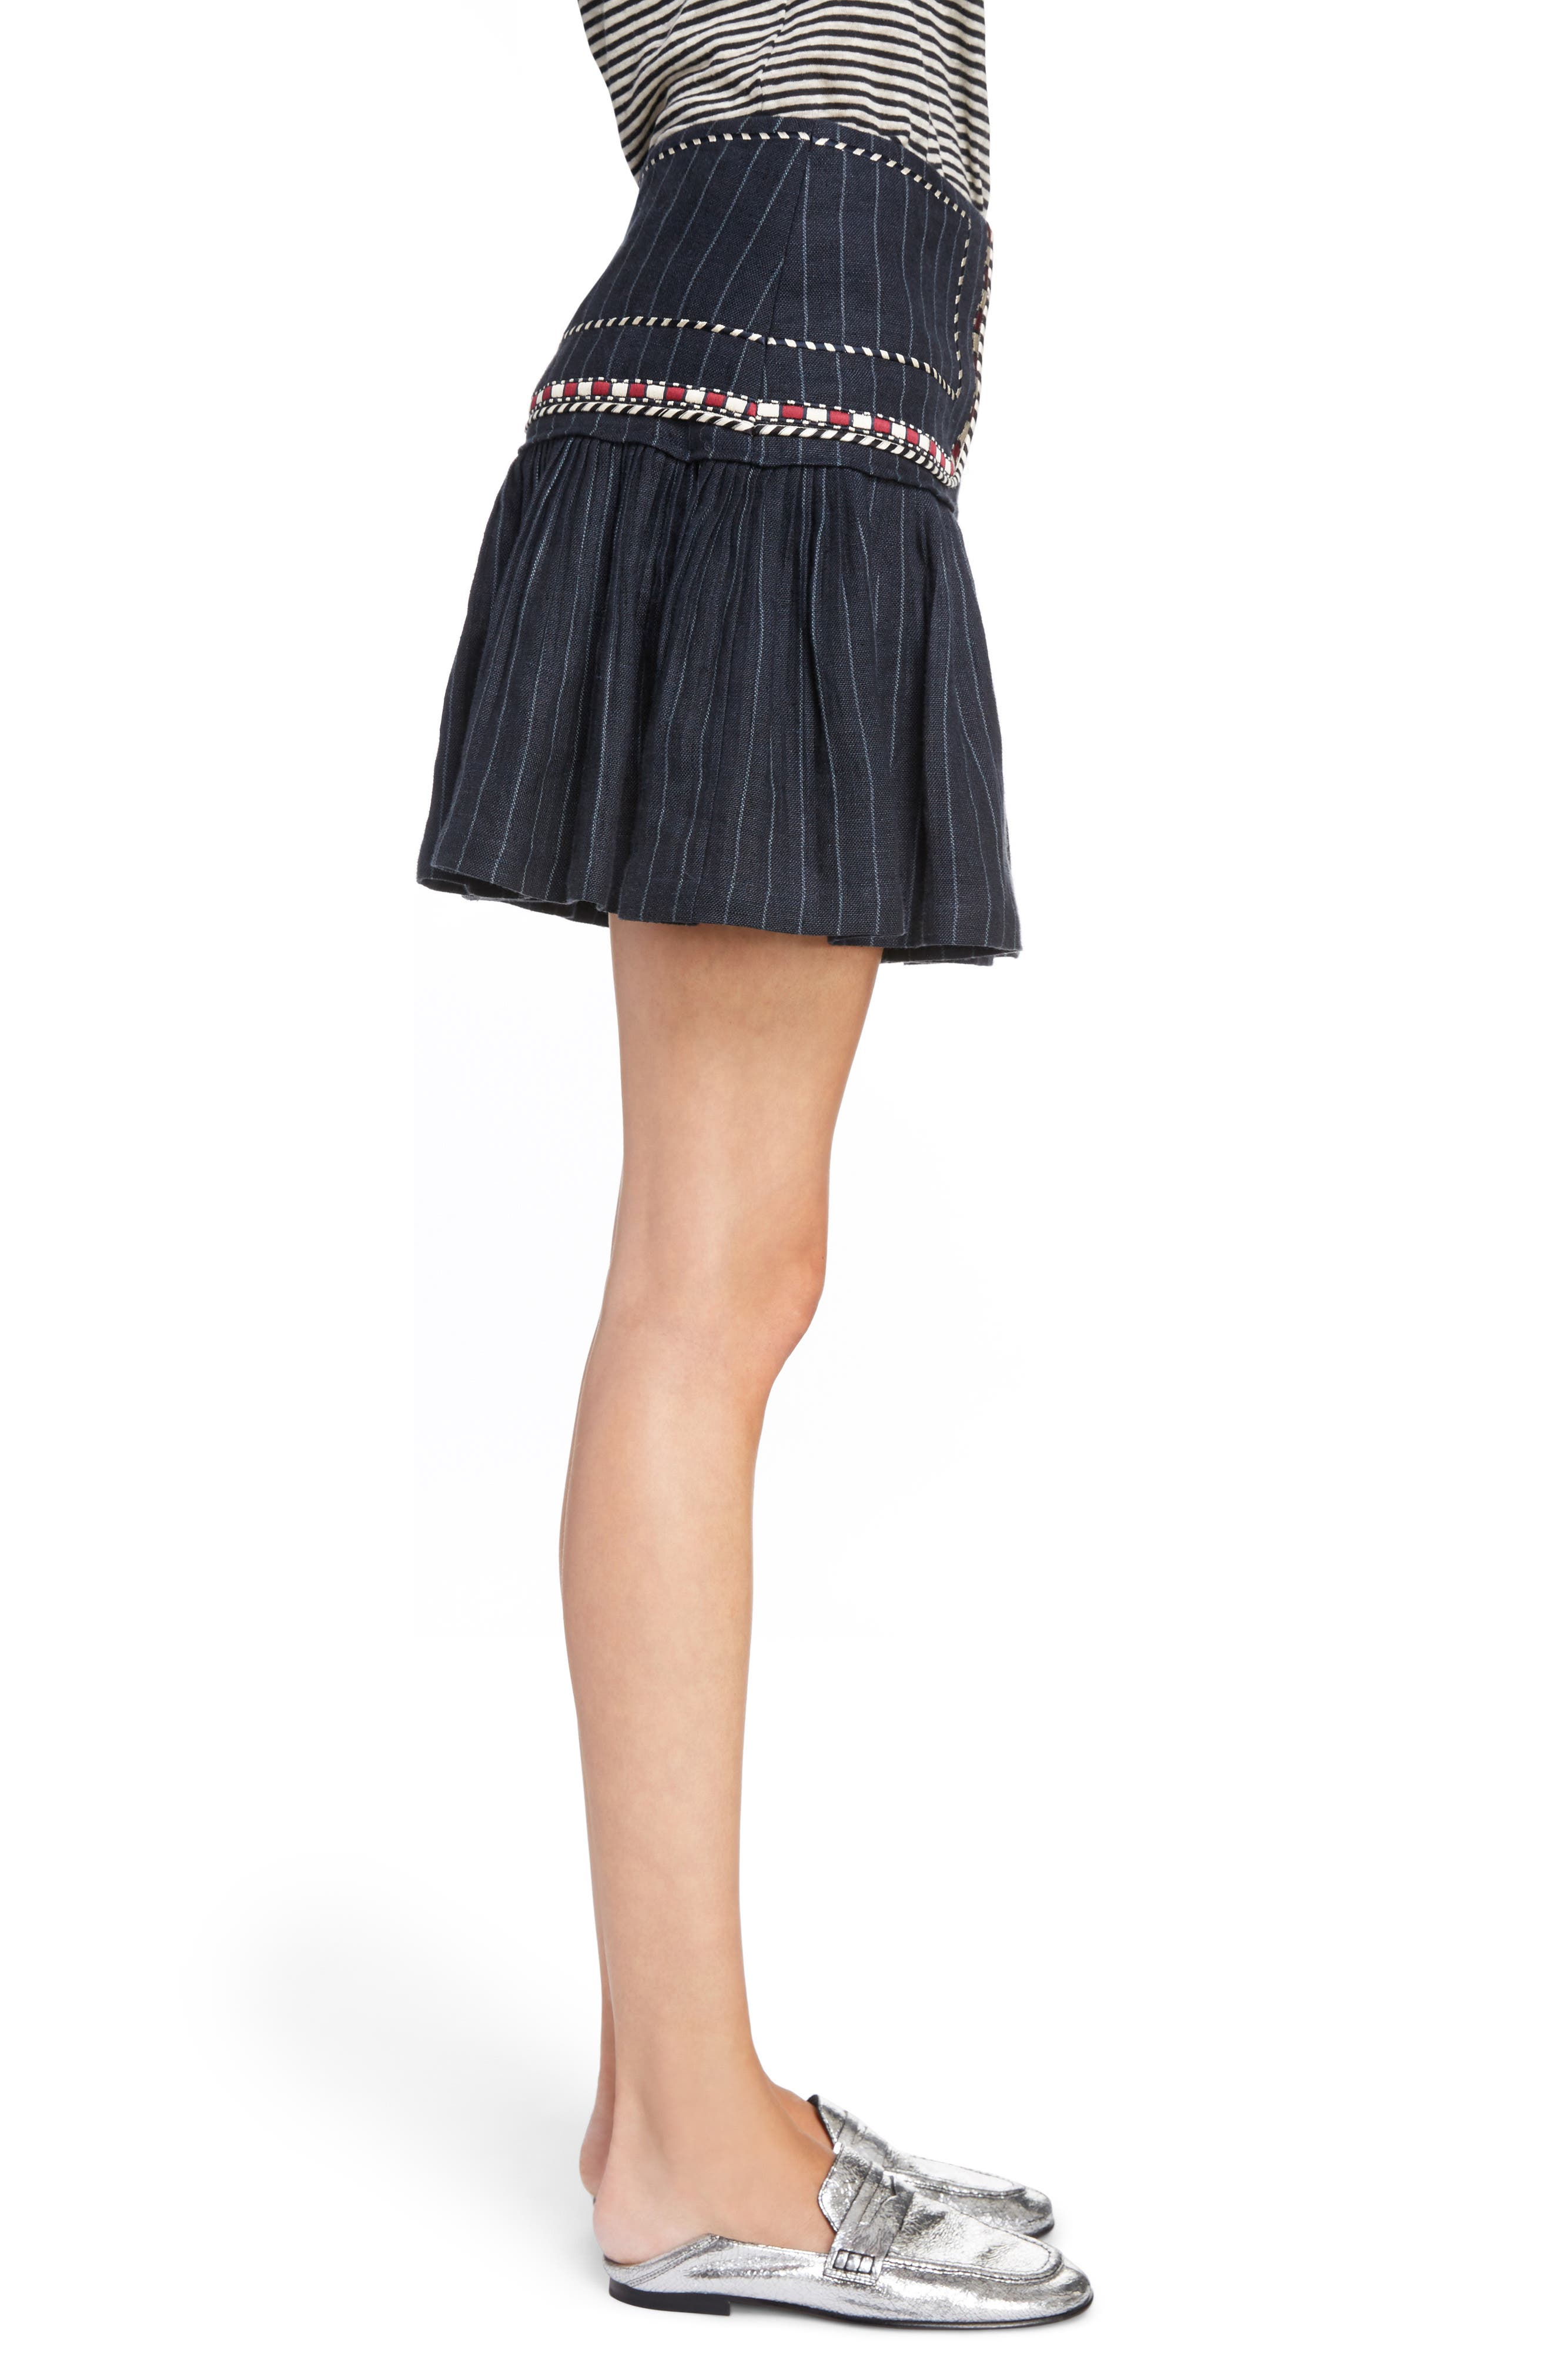 Isabel Marant Étoile Jessie Embroidered Linen Skirt,                             Alternate thumbnail 3, color,                             001